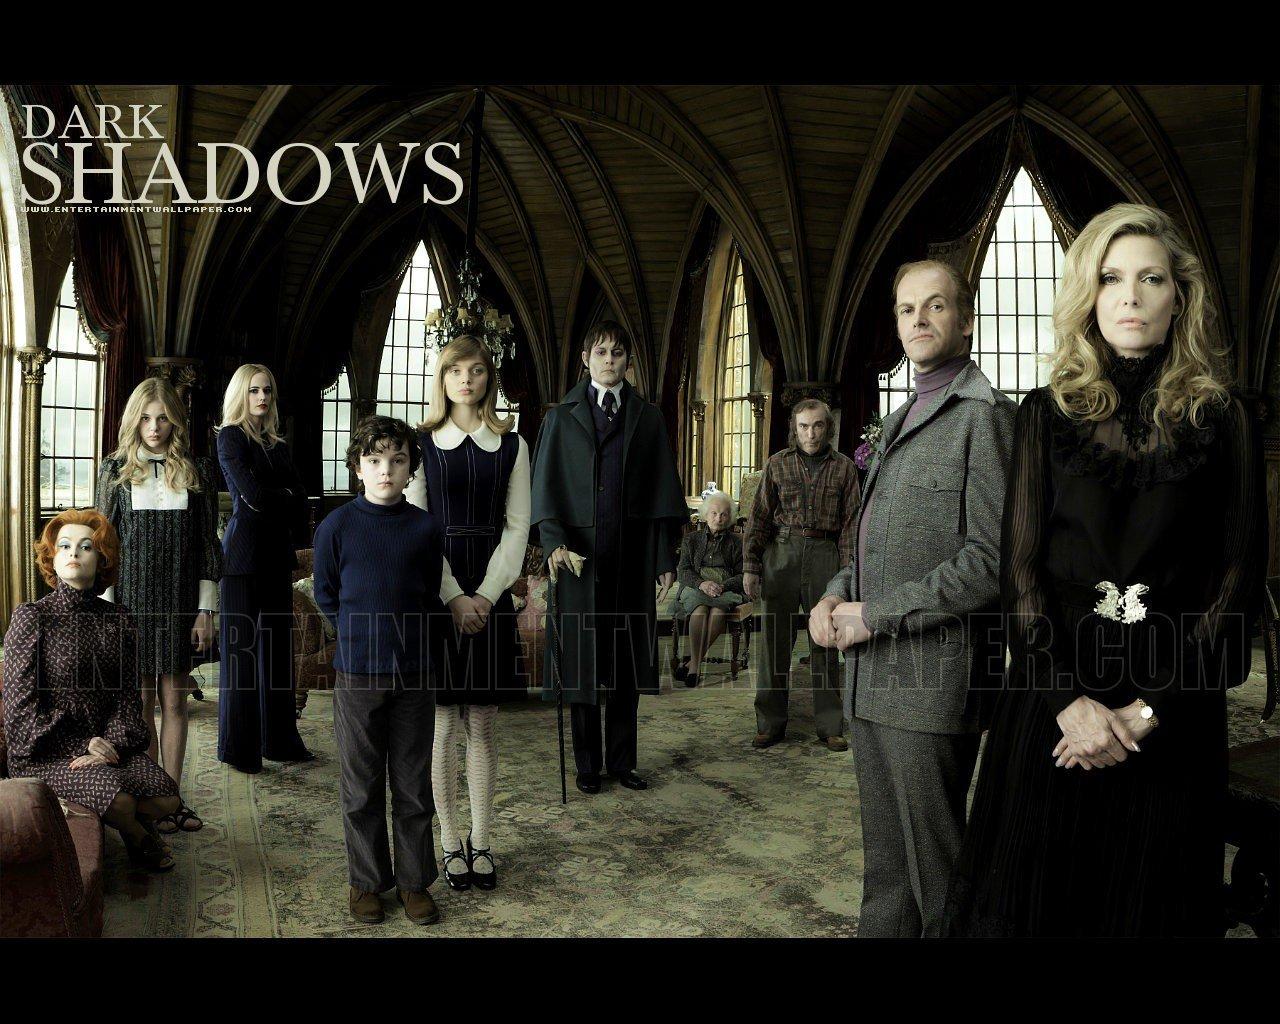 Related Pictures shadow dark wallpaper shadow dark desktop background 1280x1024